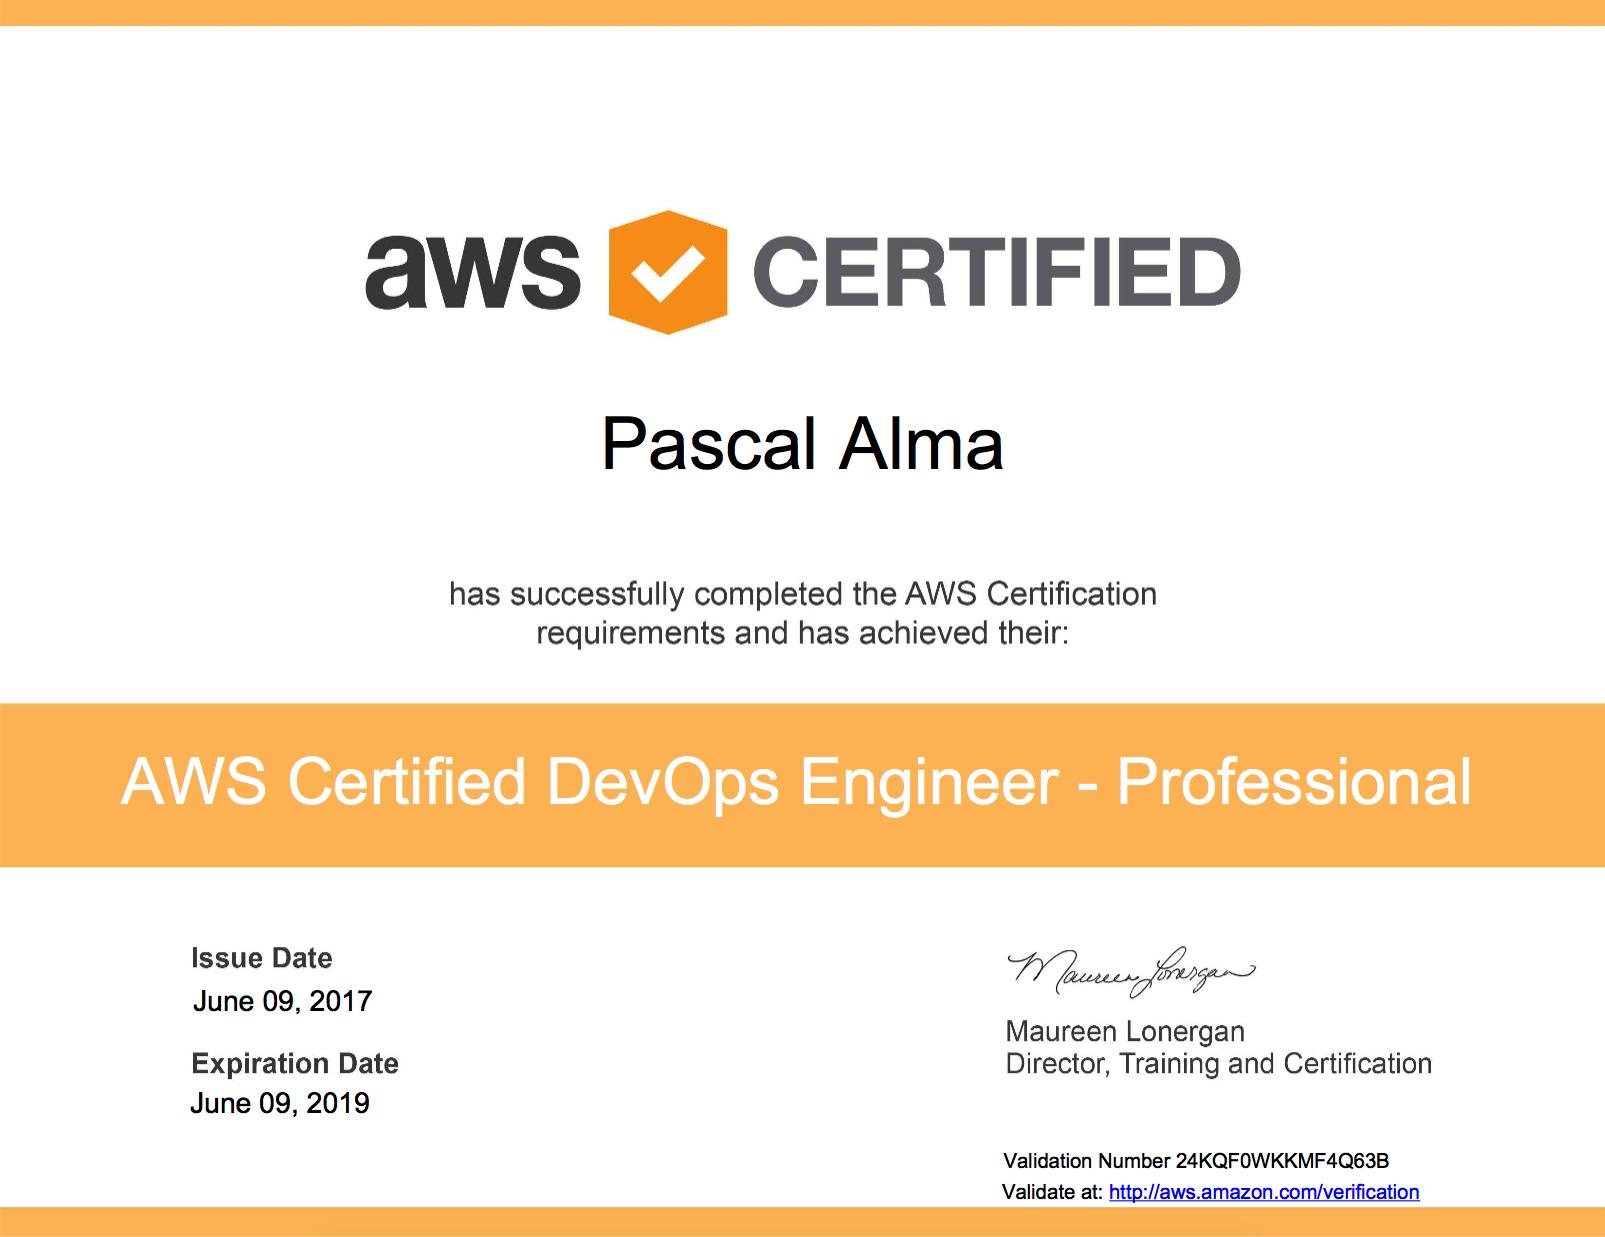 Aws Devops Engineer Professional Got It The Pragmatic Integrator